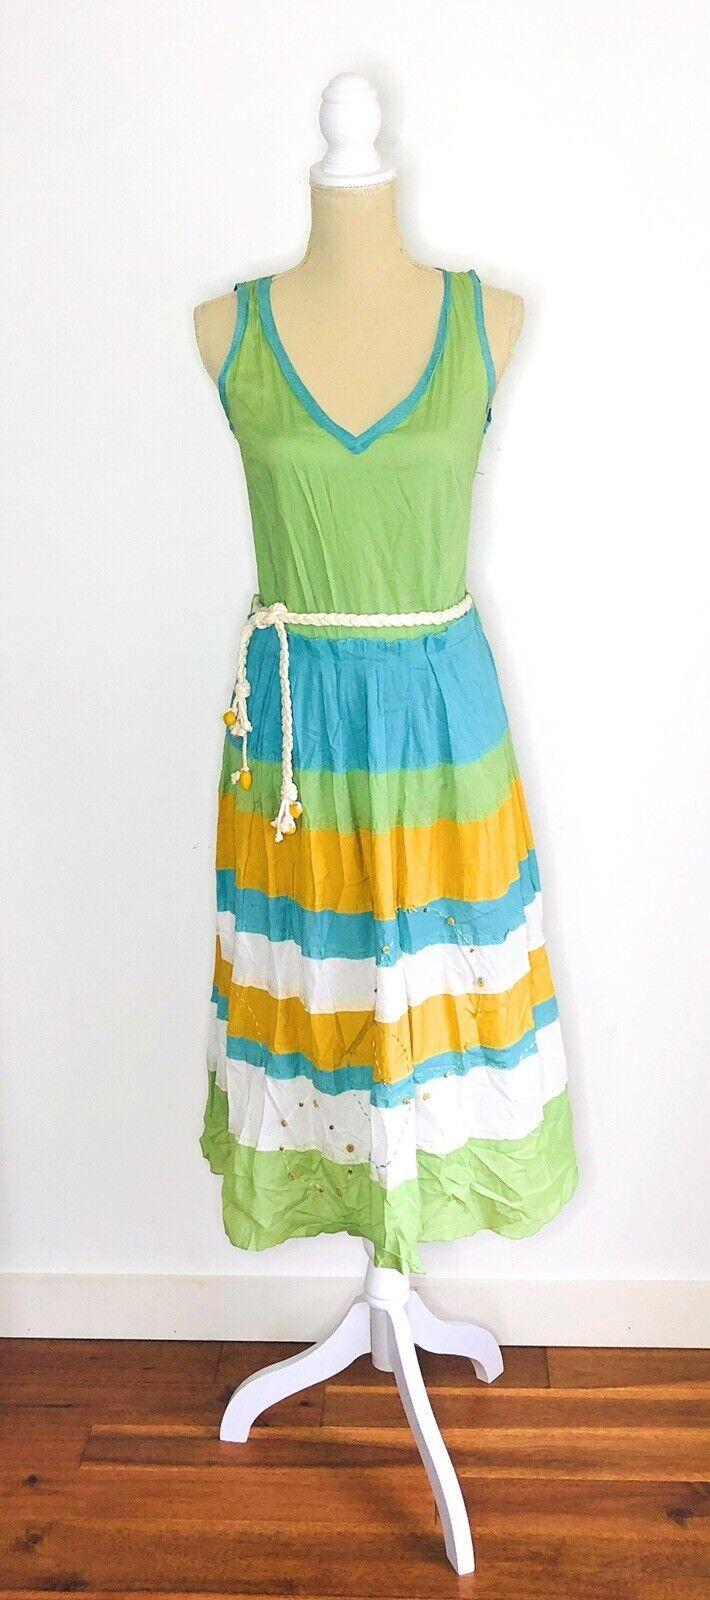 Aquarius Anthropologie Sleeveless Dress Braided Belt Hobo Hippy